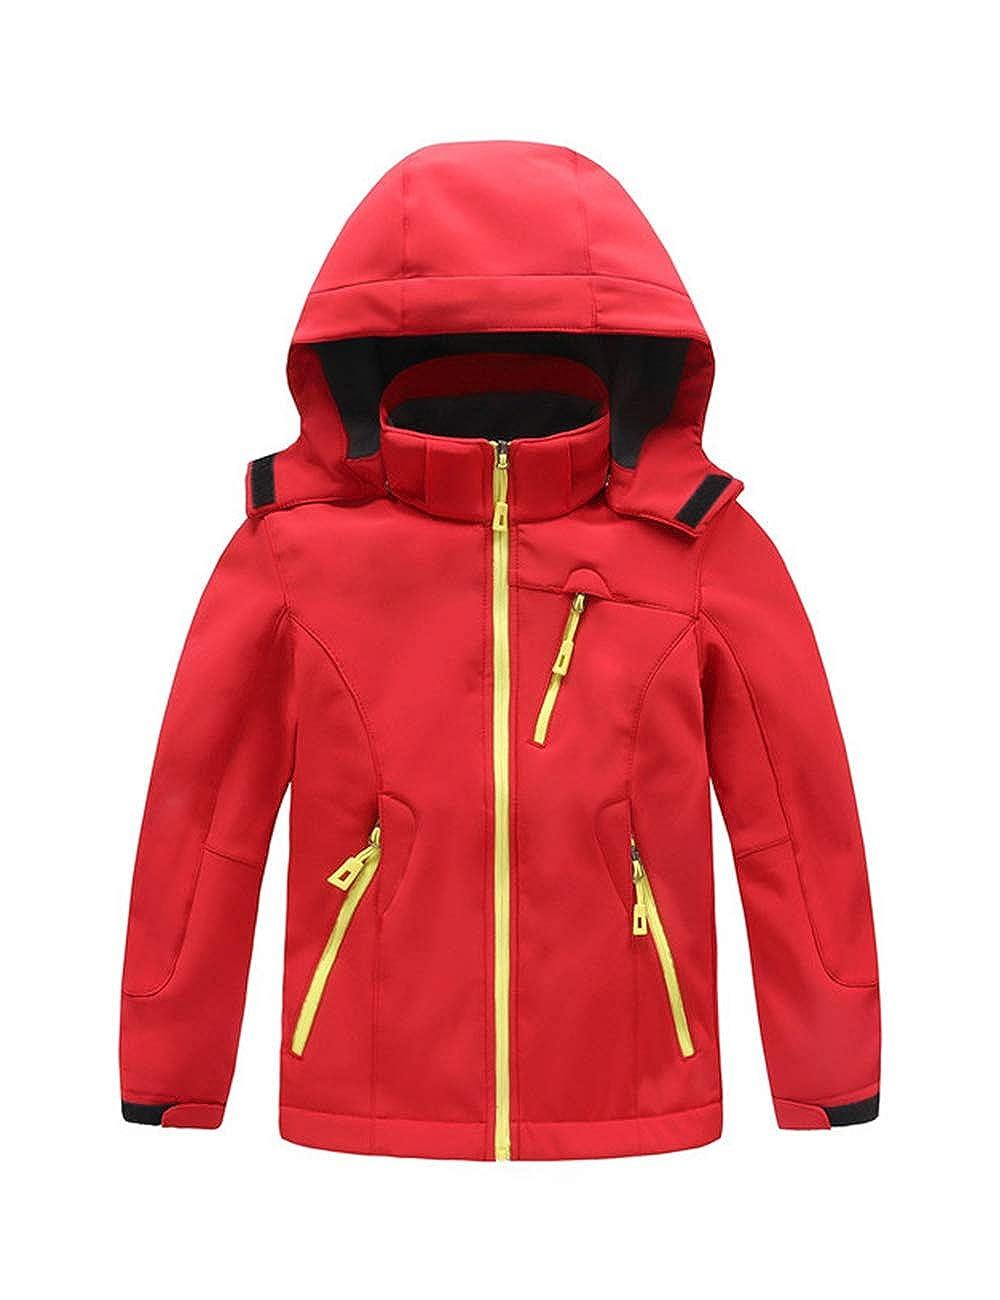 BESBOMIG Kids Children Softshell Coat Jacket Hood Windbreaker Soft Fleece Lining